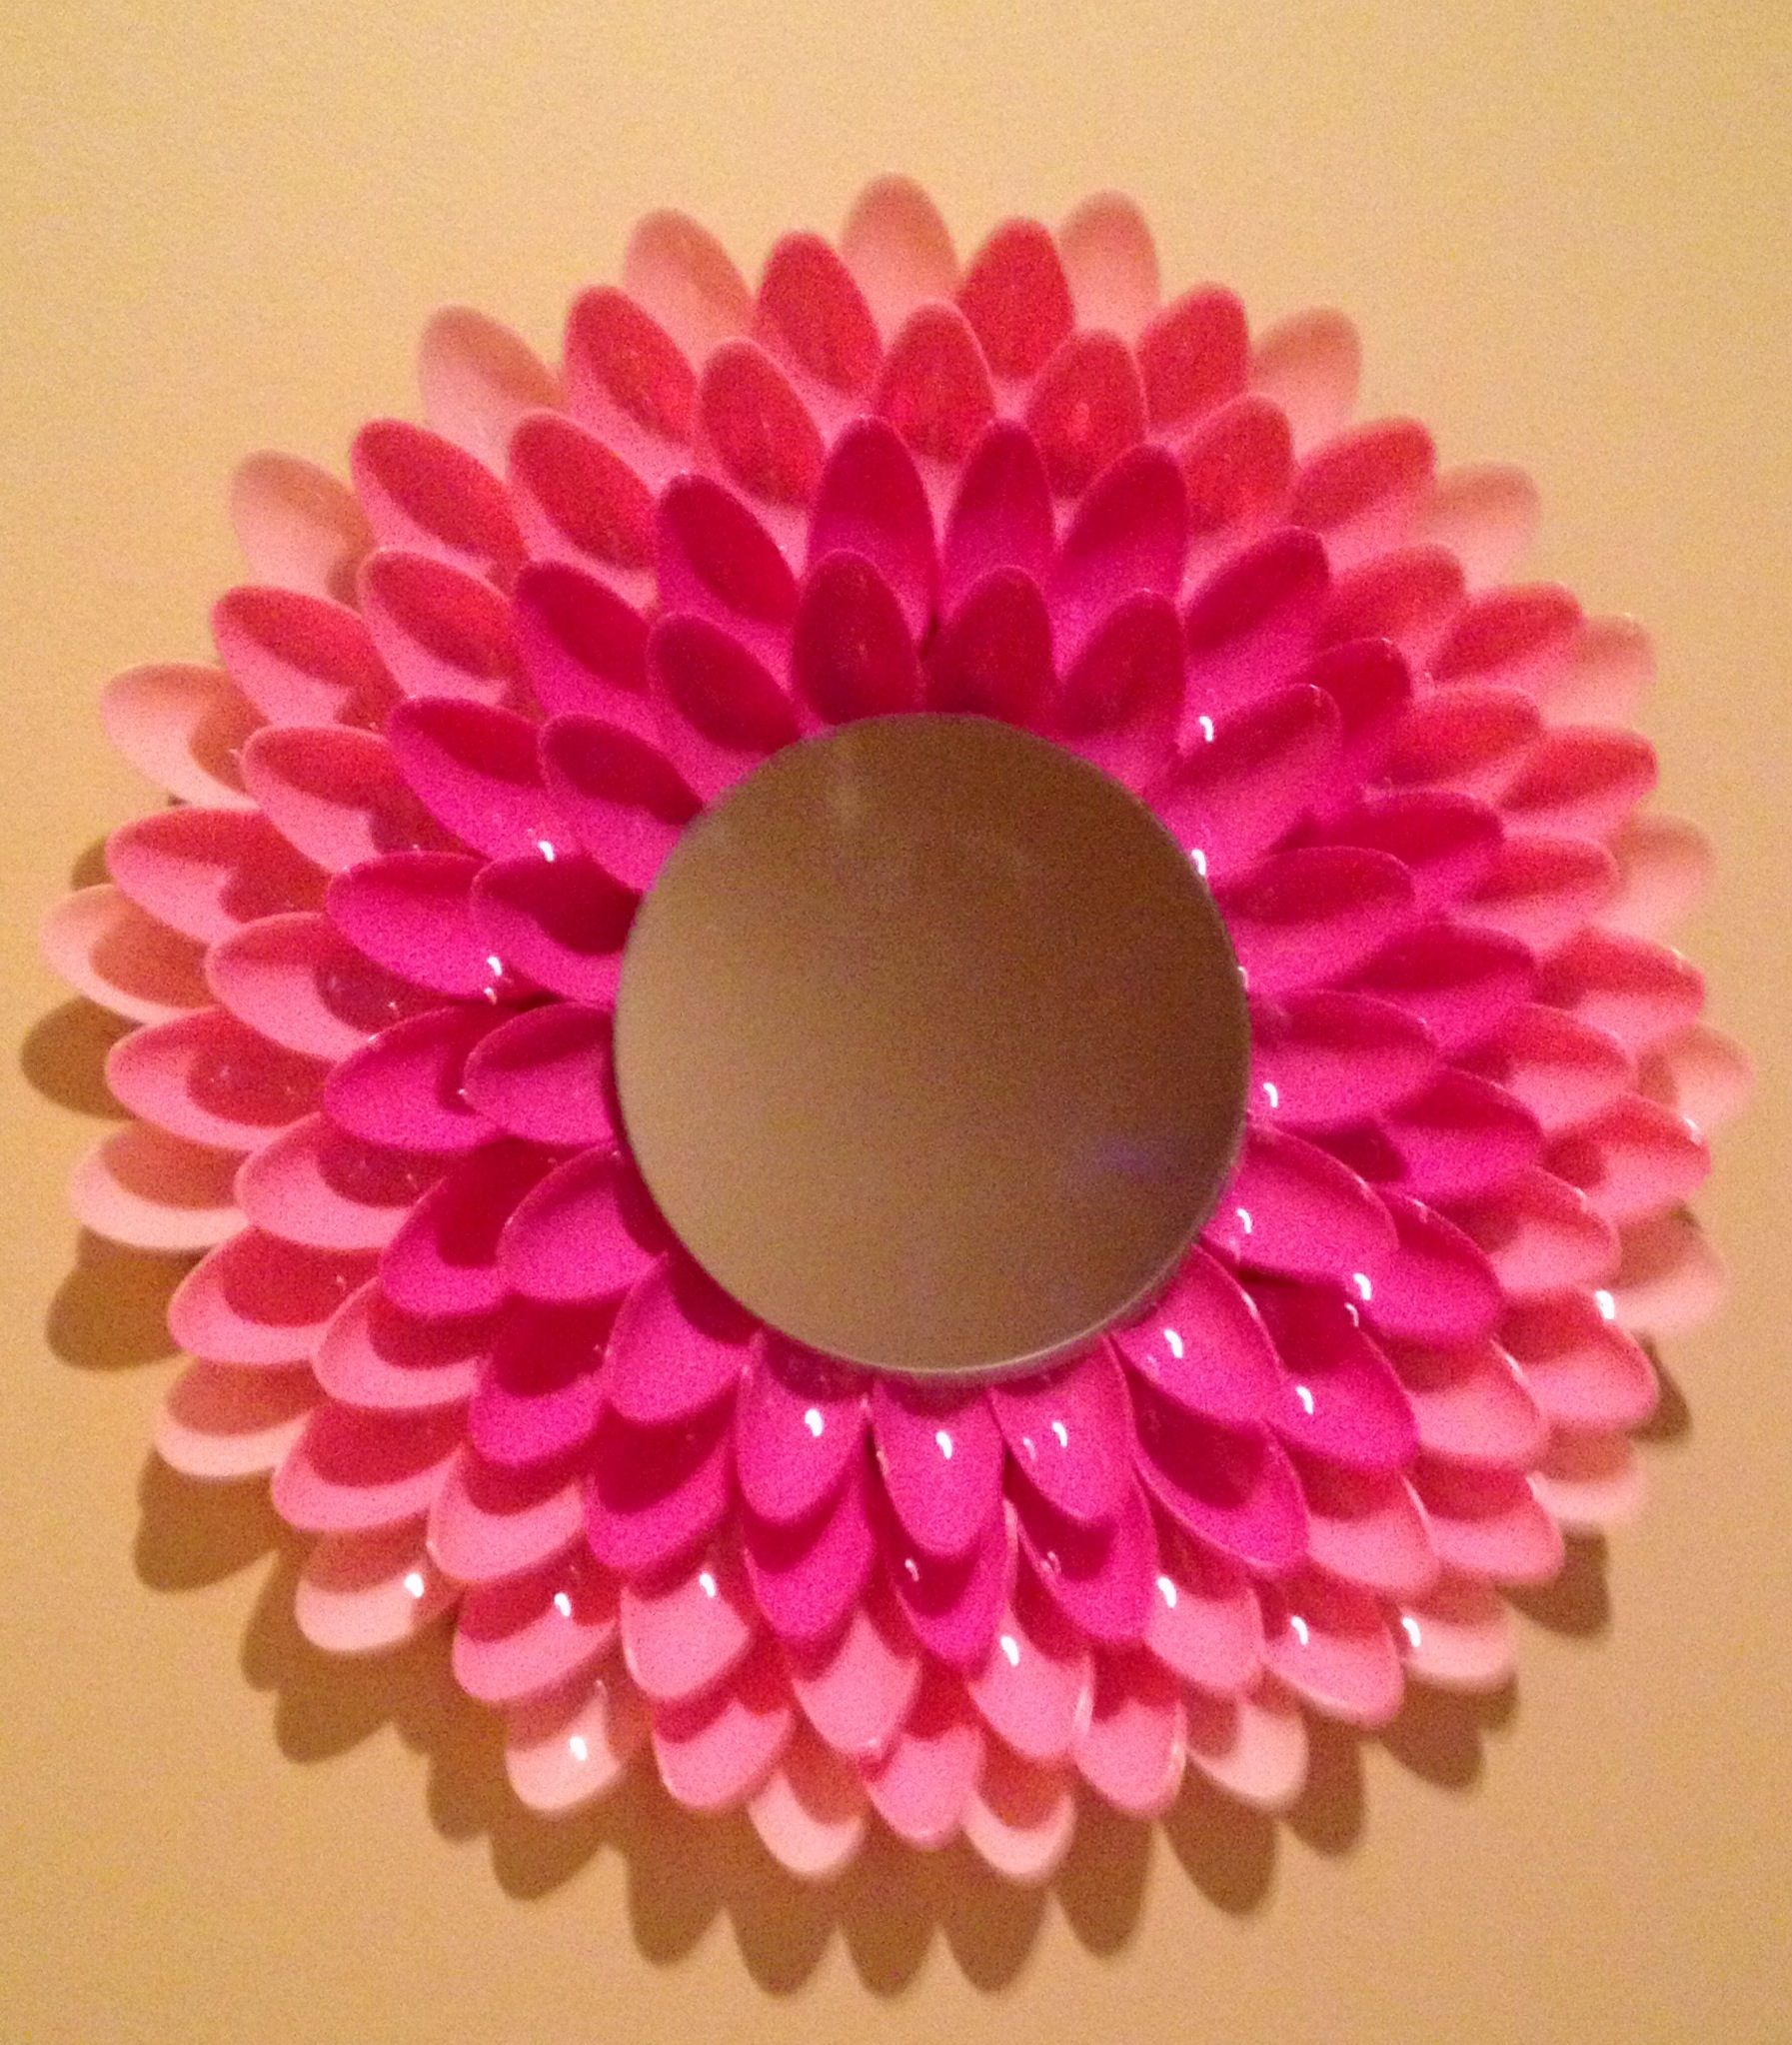 Spoon mirror DIY My Creations Pinterest